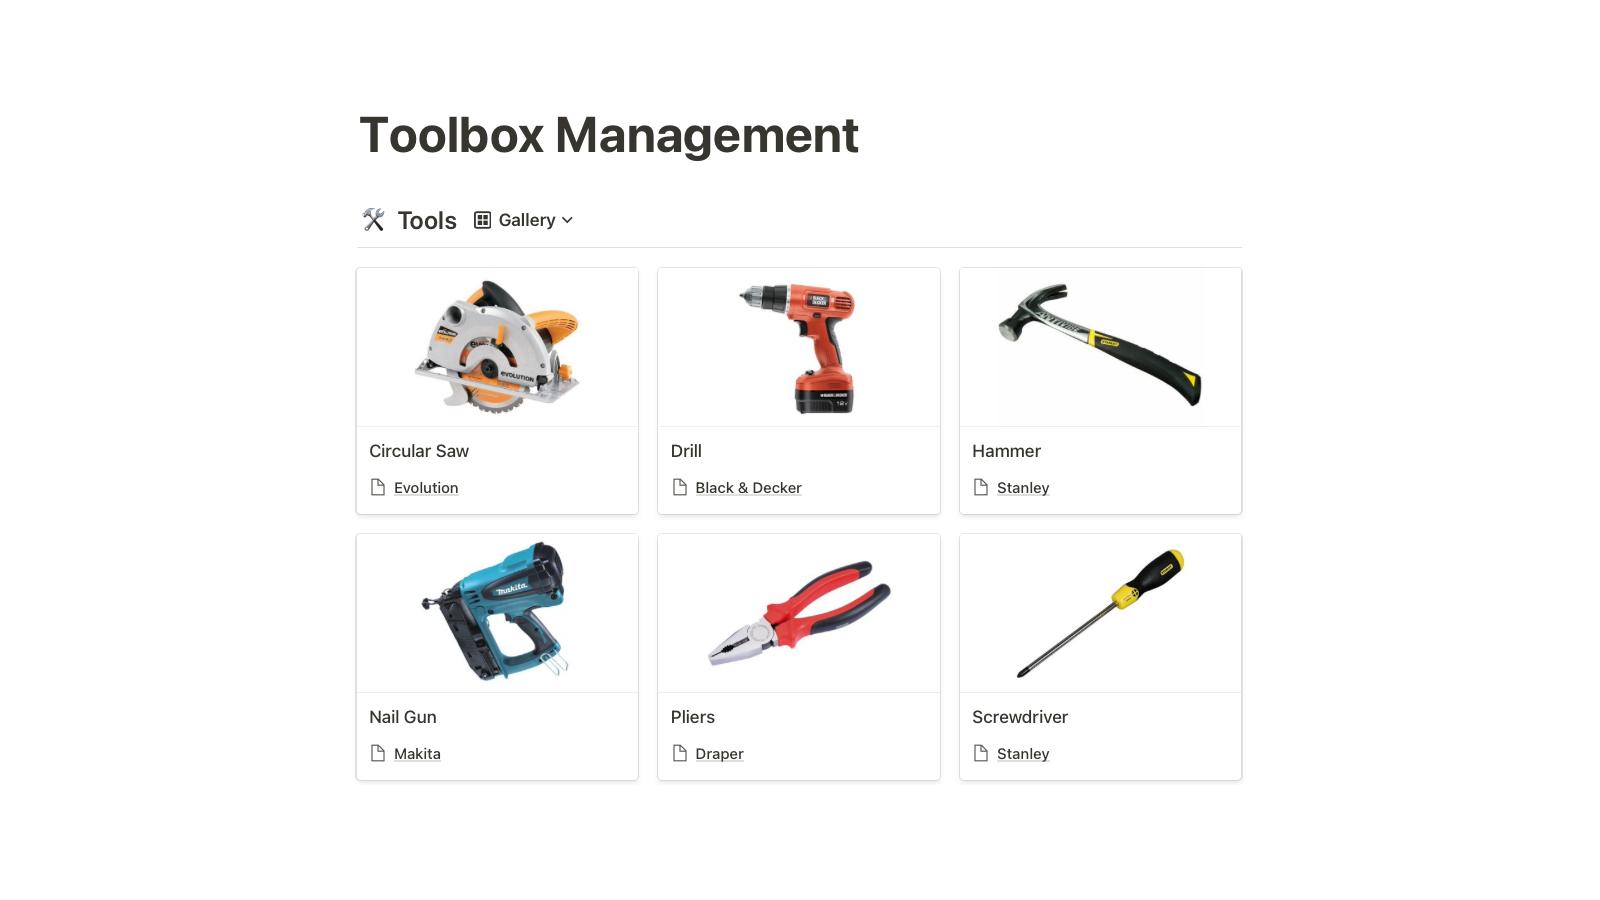 Toolbox Management